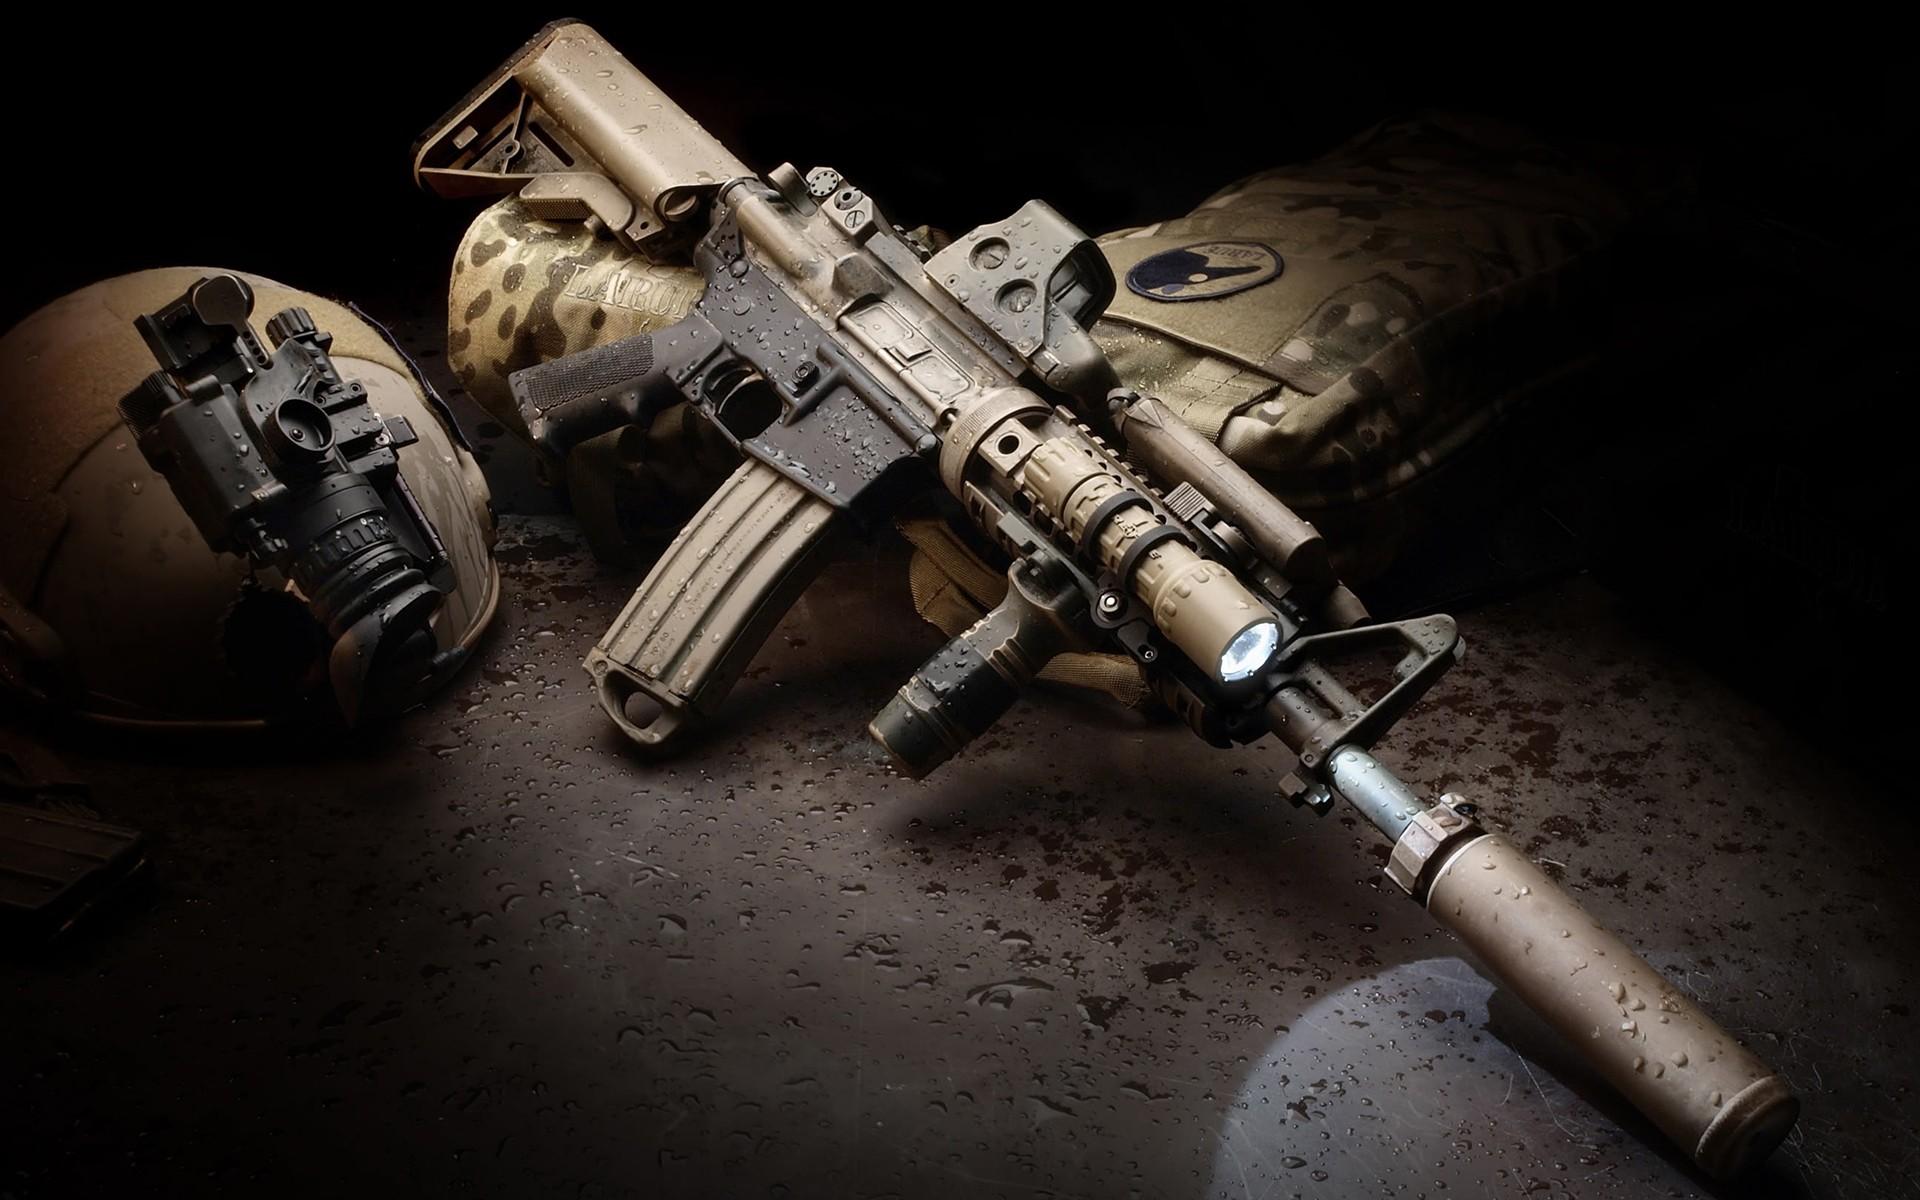 gustan las armas y las mujeres Wallpapers full HD 2013   Taringa 1920x1200